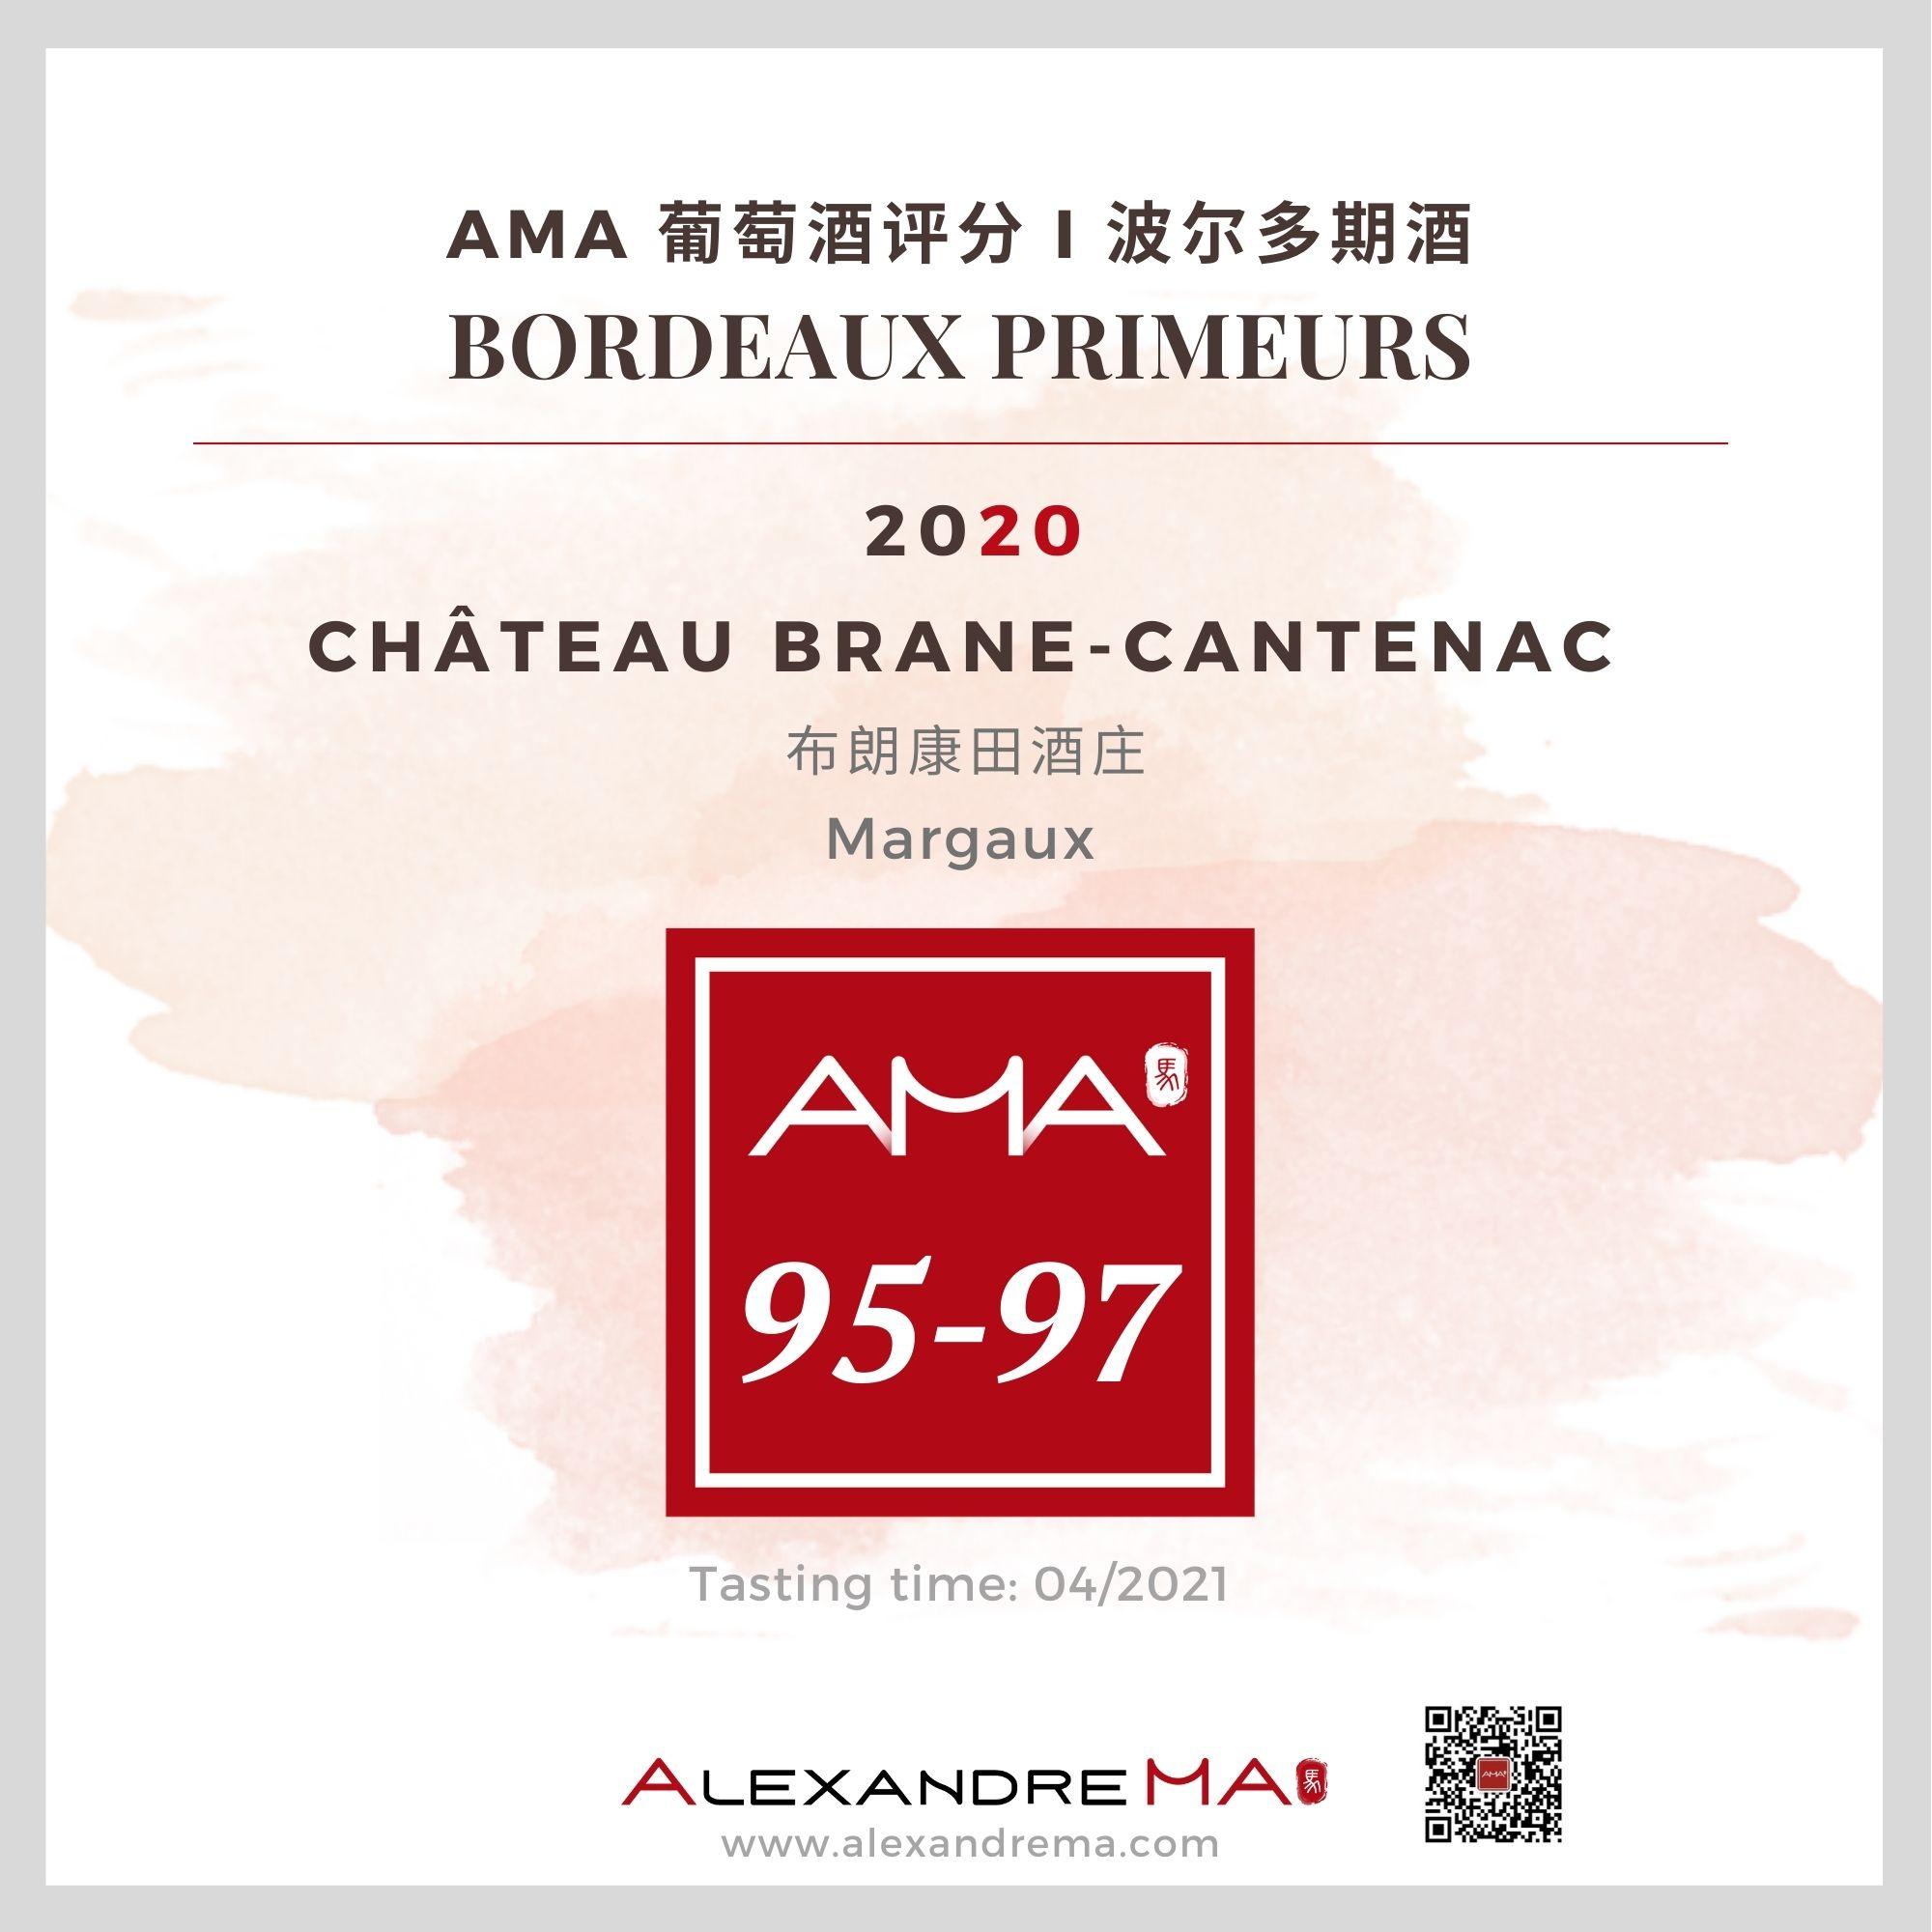 Château Brane-Cantenac 2020 布朗康田酒庄 - Alexandre Ma